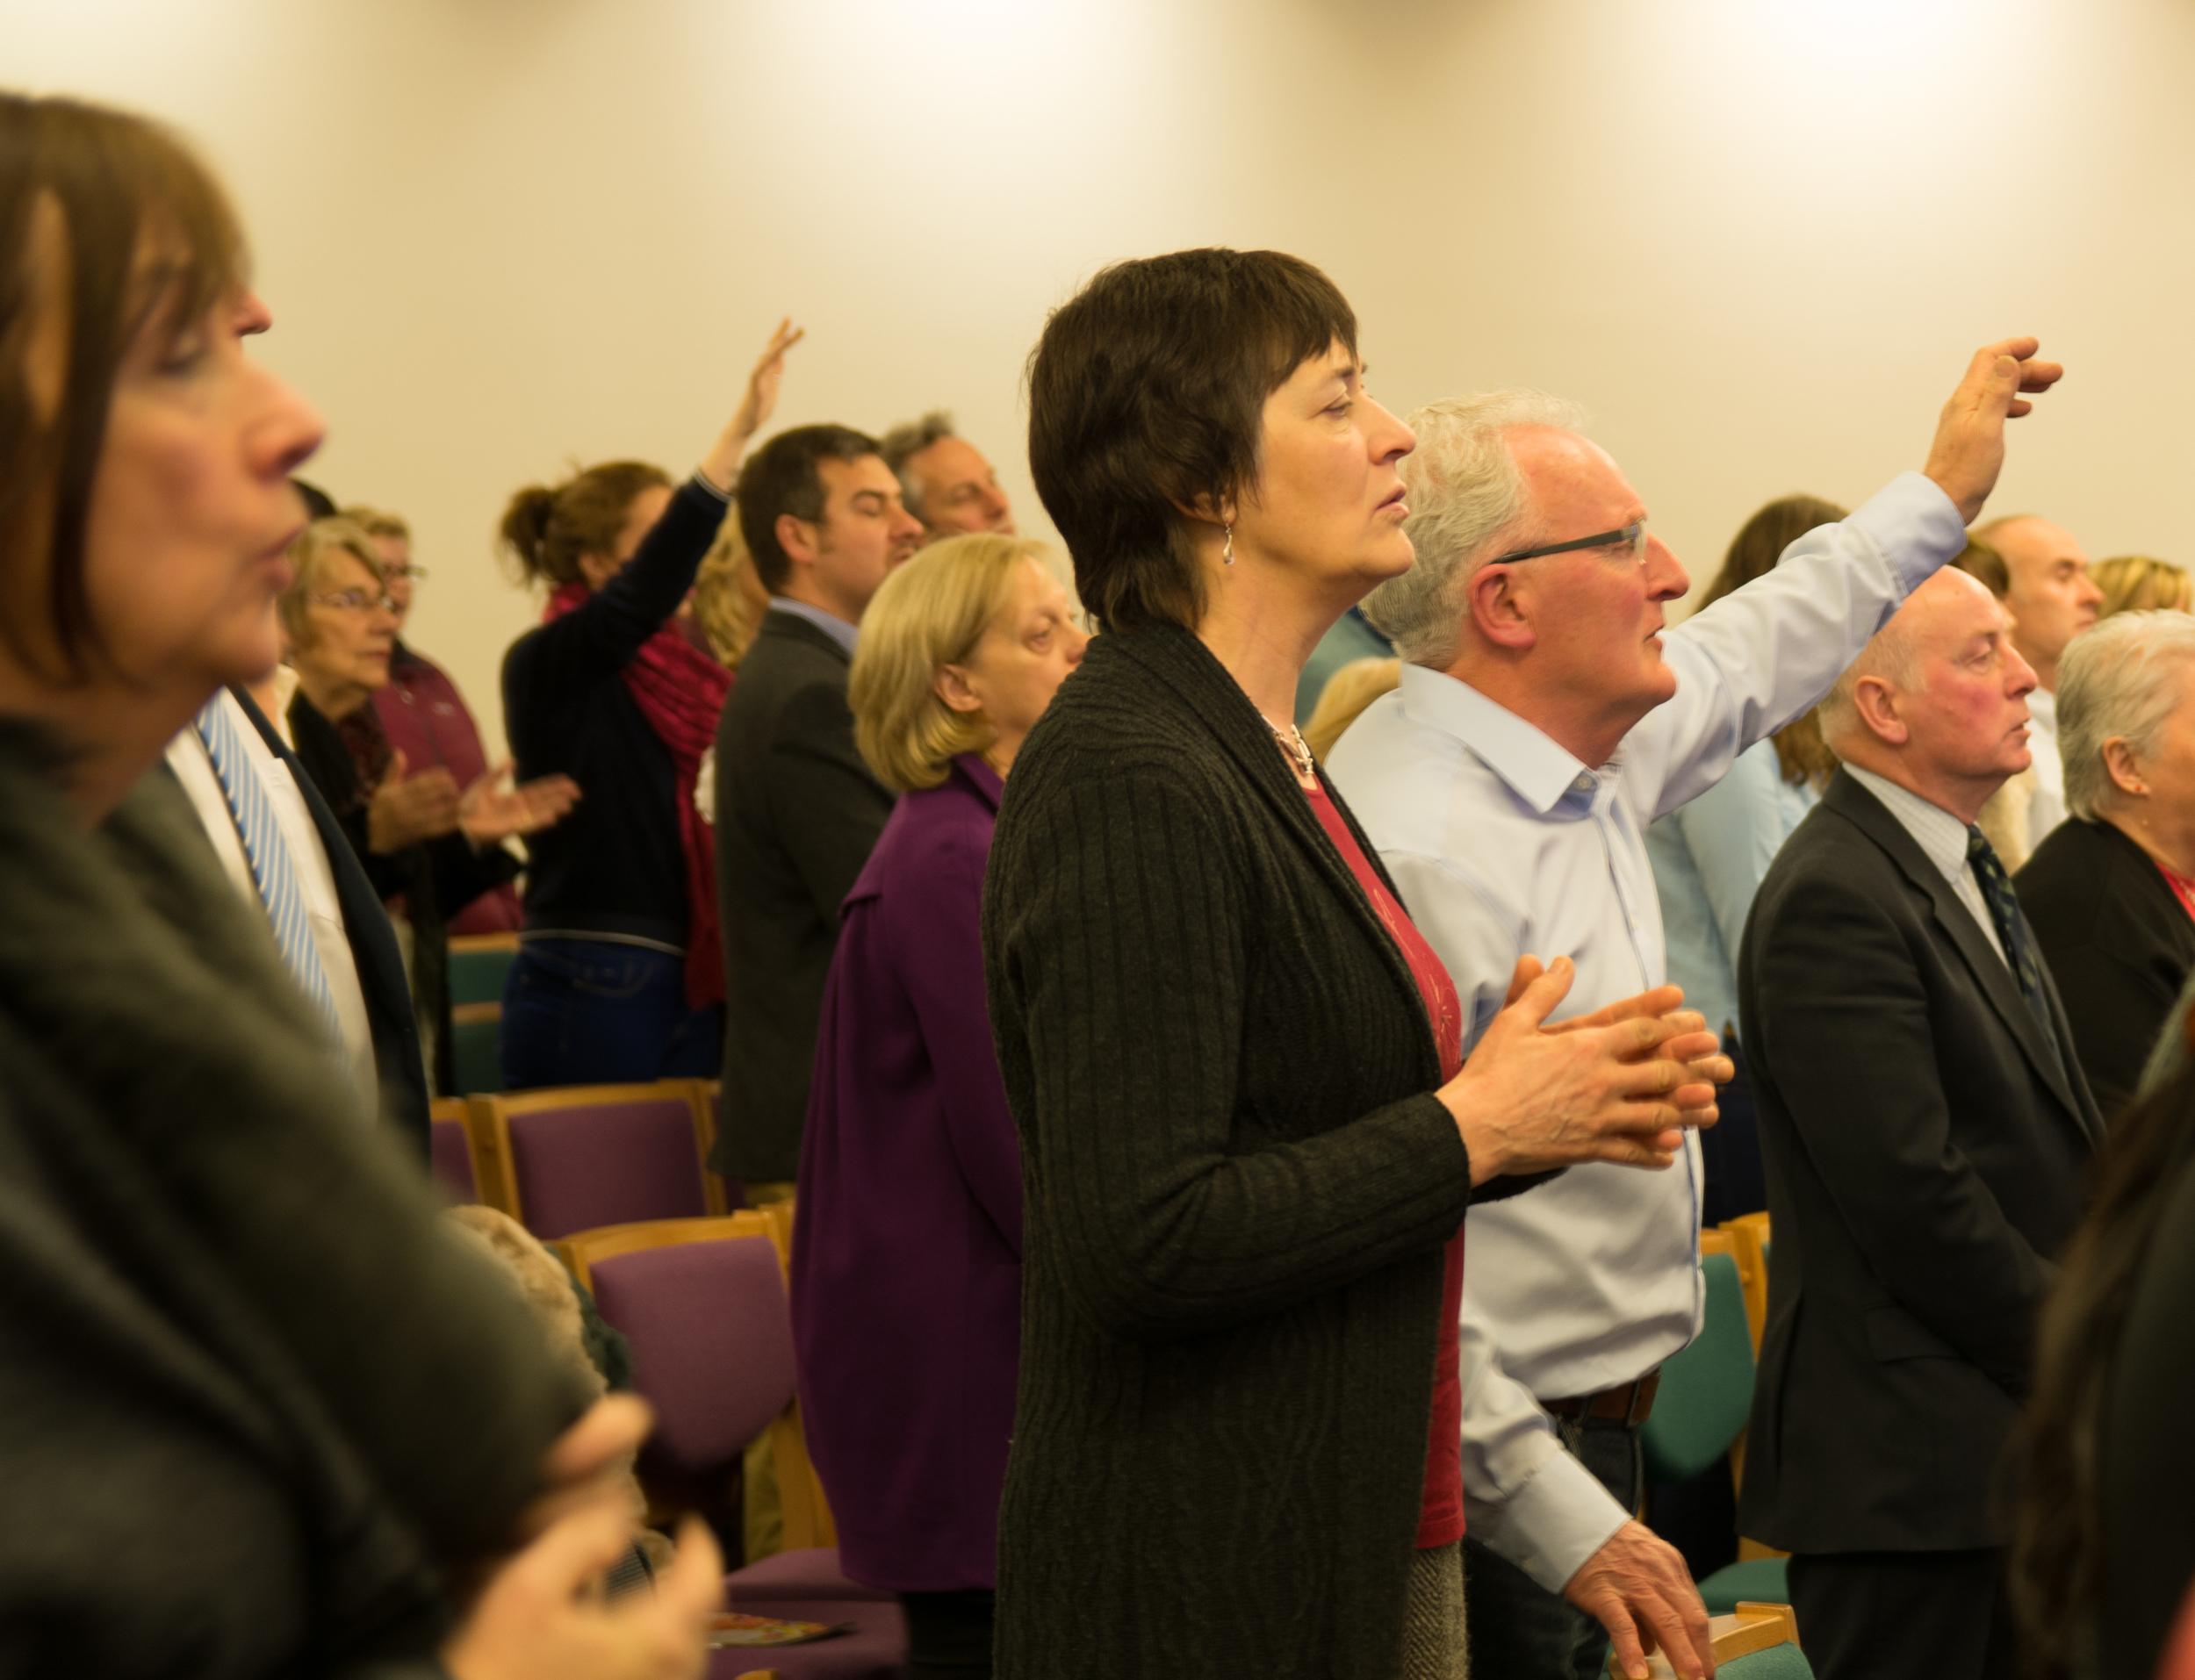 Hope Church 2016 (39 of 42).jpg